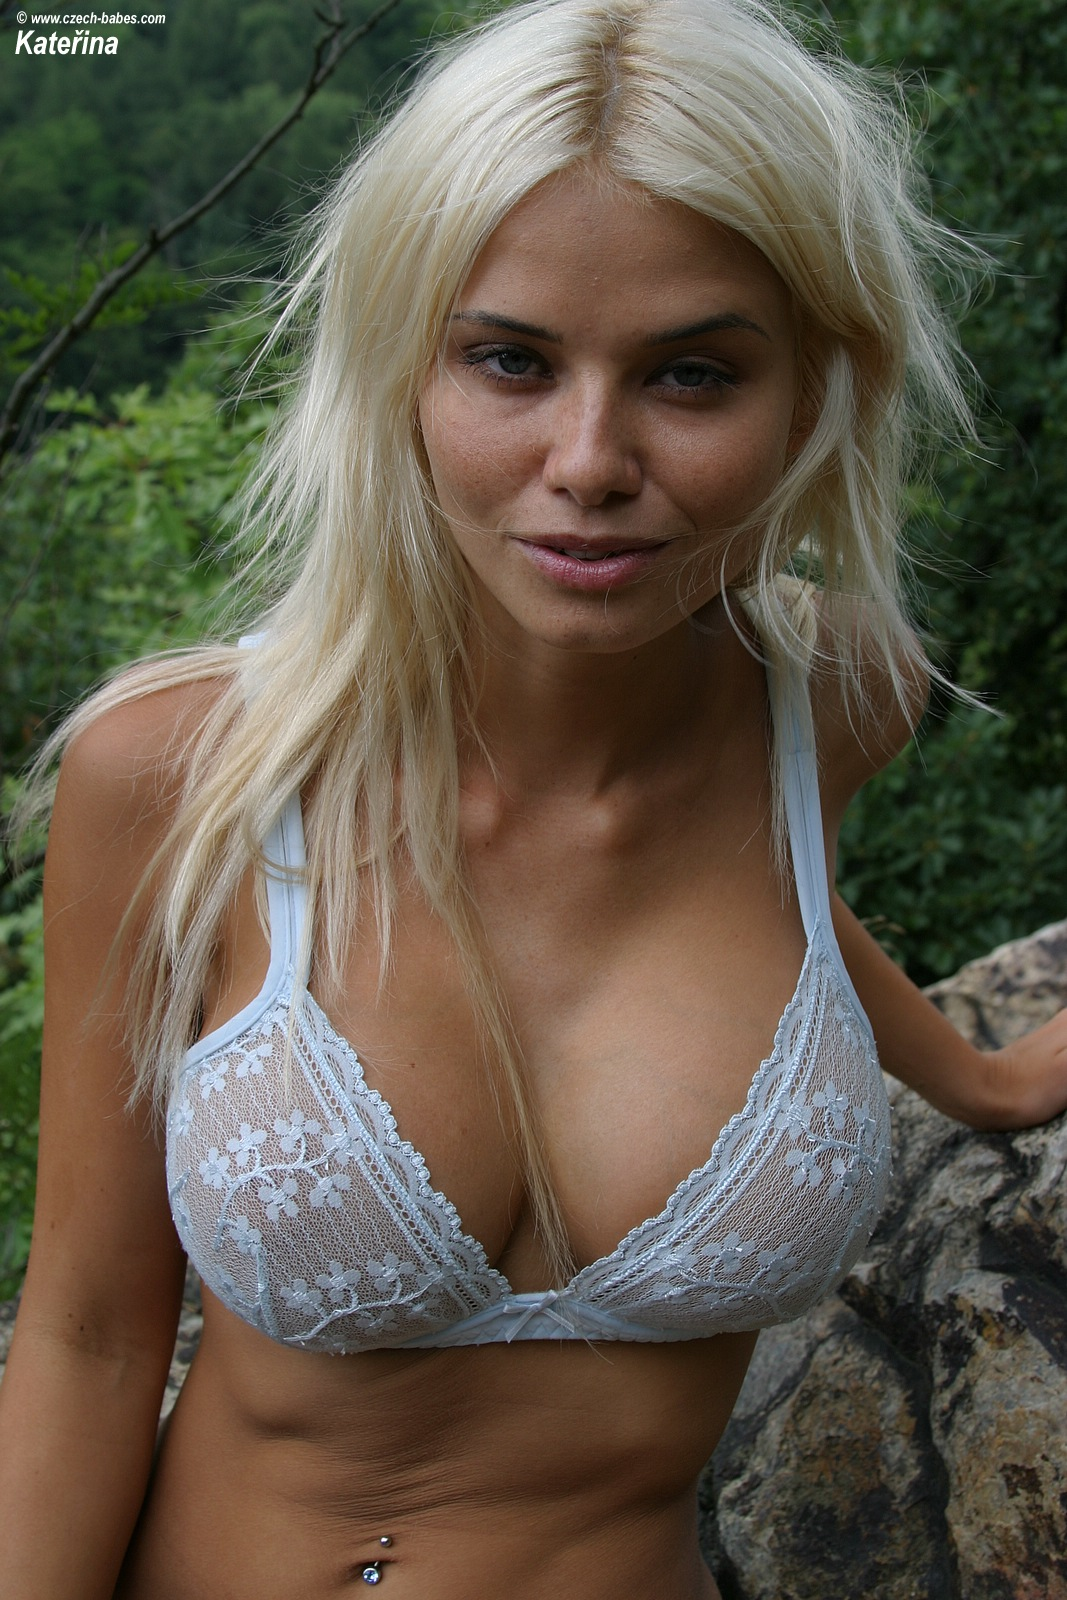 katerina-nude-mountain-lingerie-huge-tits-blonde-05